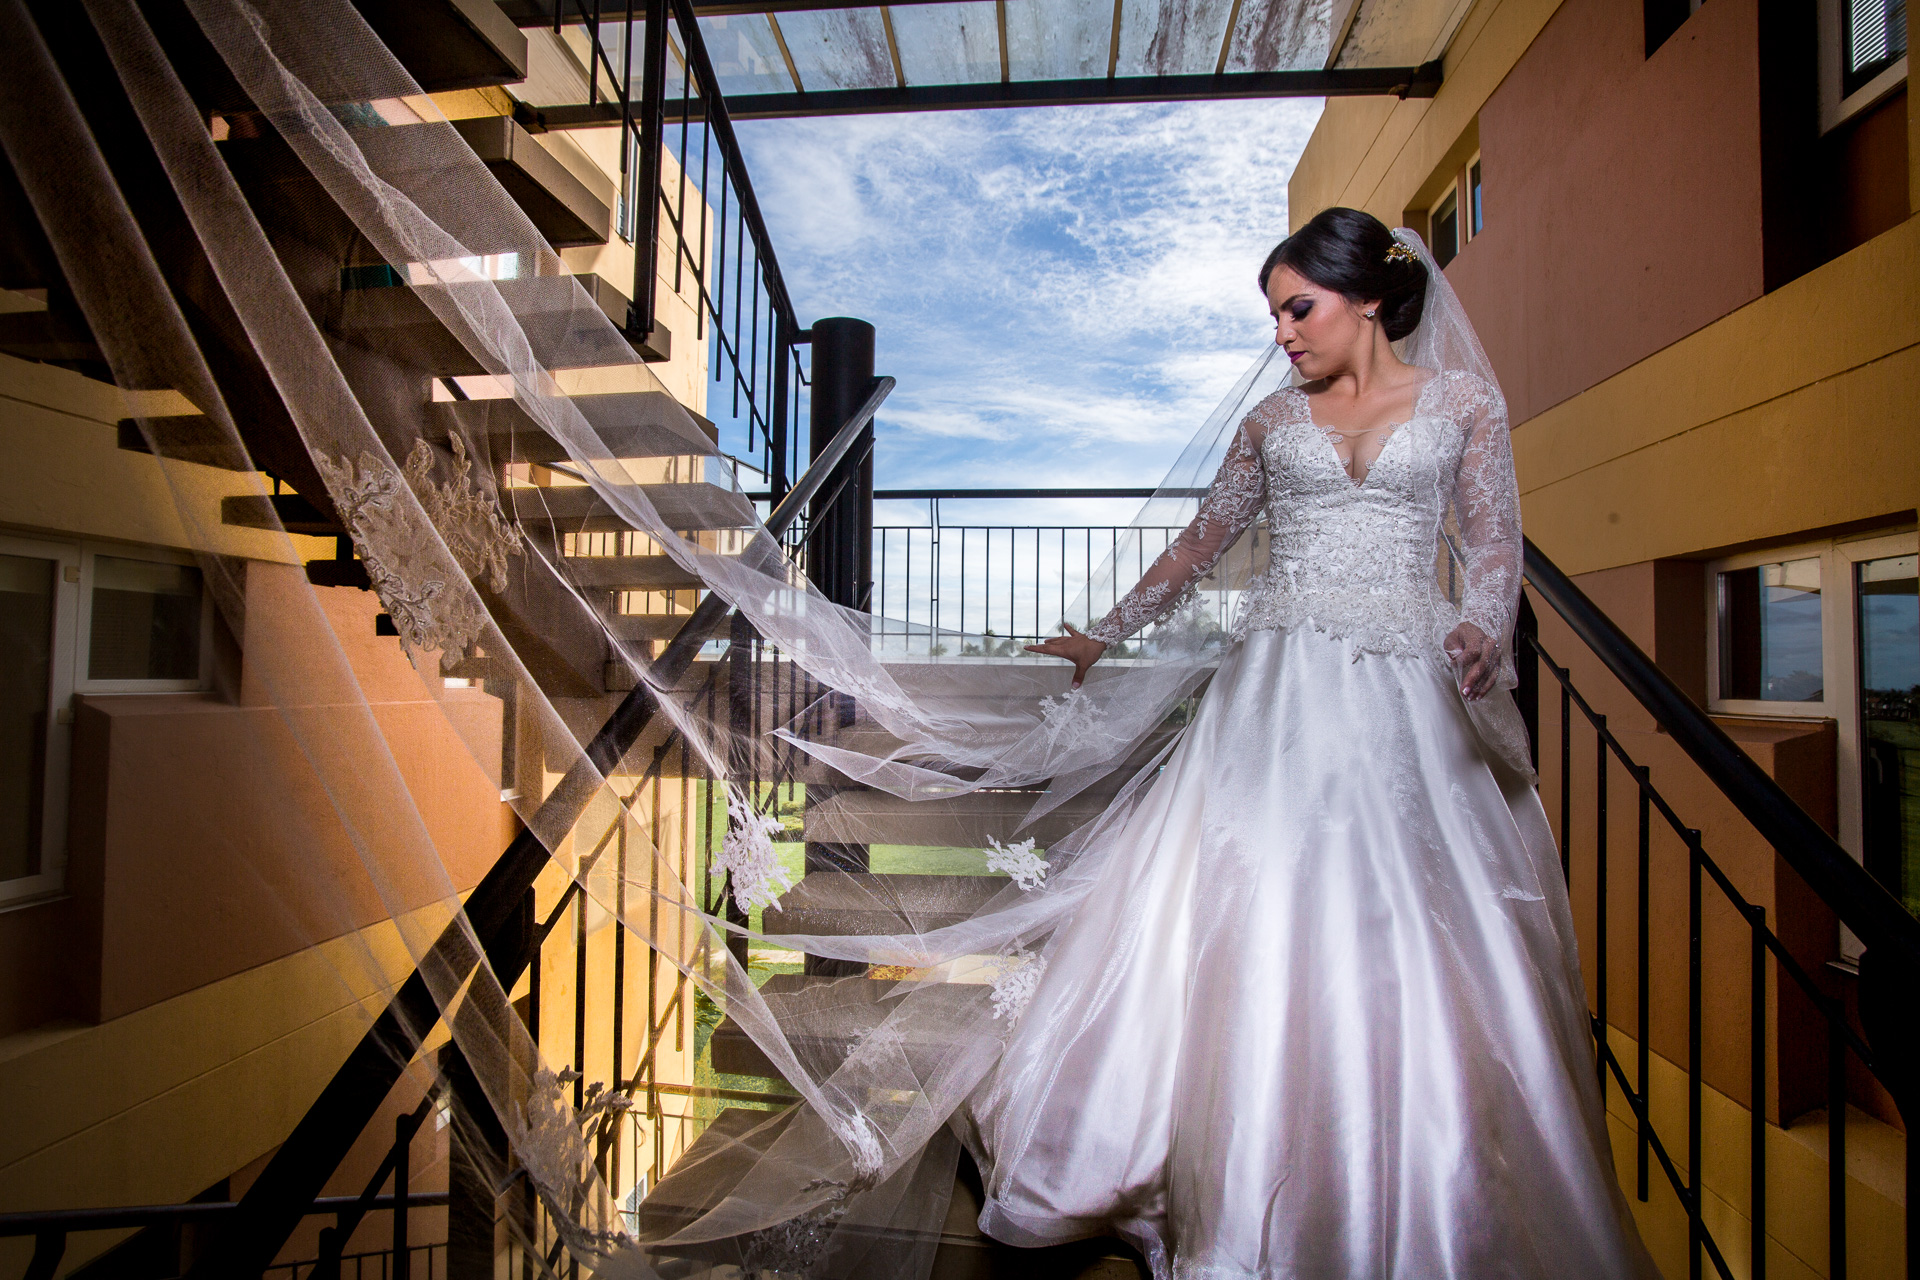 Fotógrafos-de-bodas-en-Colombia-Sthephanie-y-David-26 STEPHANIE + DAVID